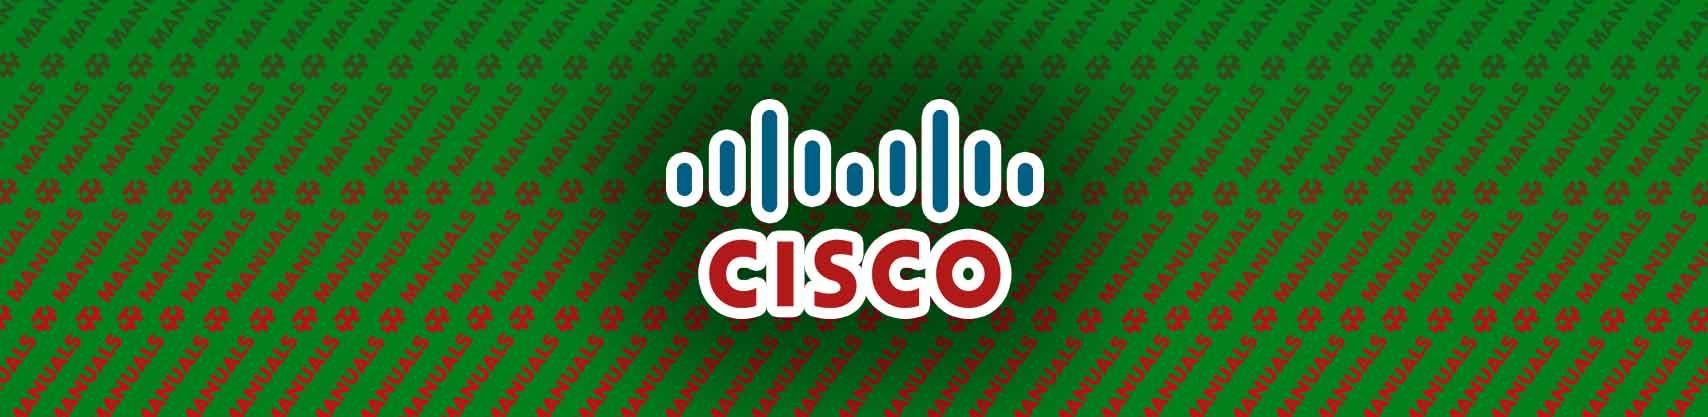 Cisco E1200 Manual